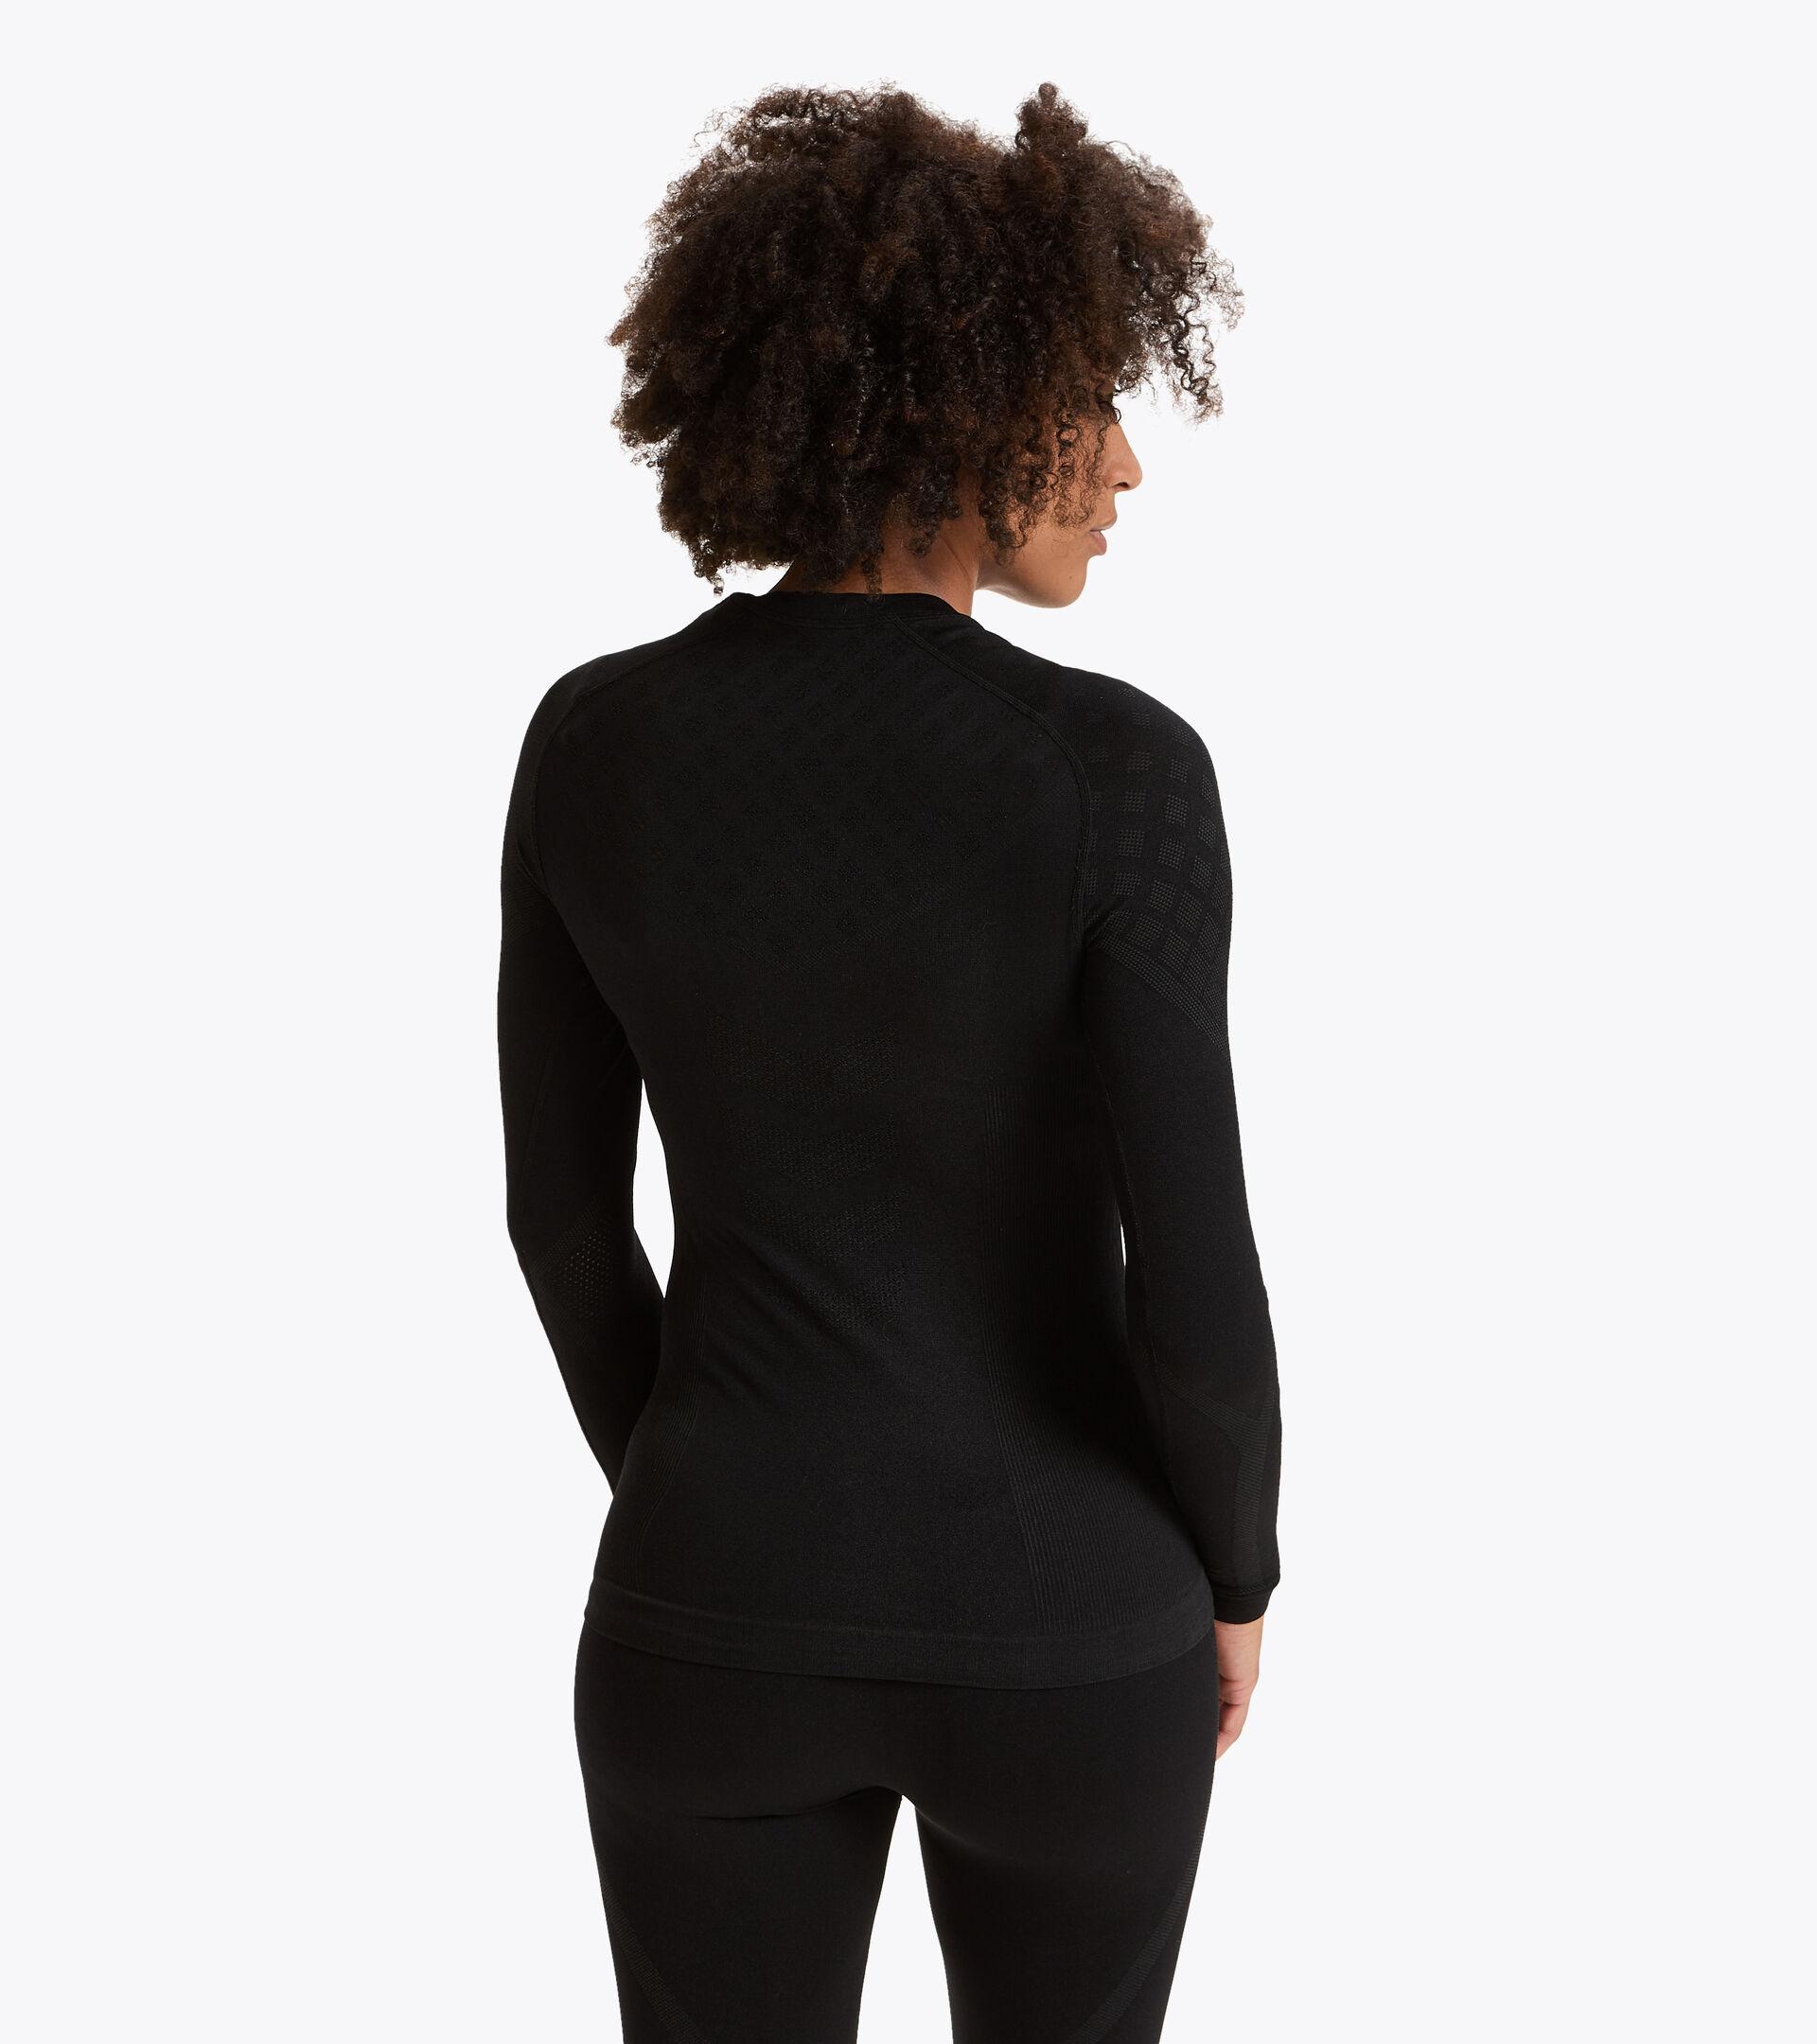 Camiseta de entrenamiento de manga larga - Mujer L. LS T-SHIRT ACT NEGRO - Diadora